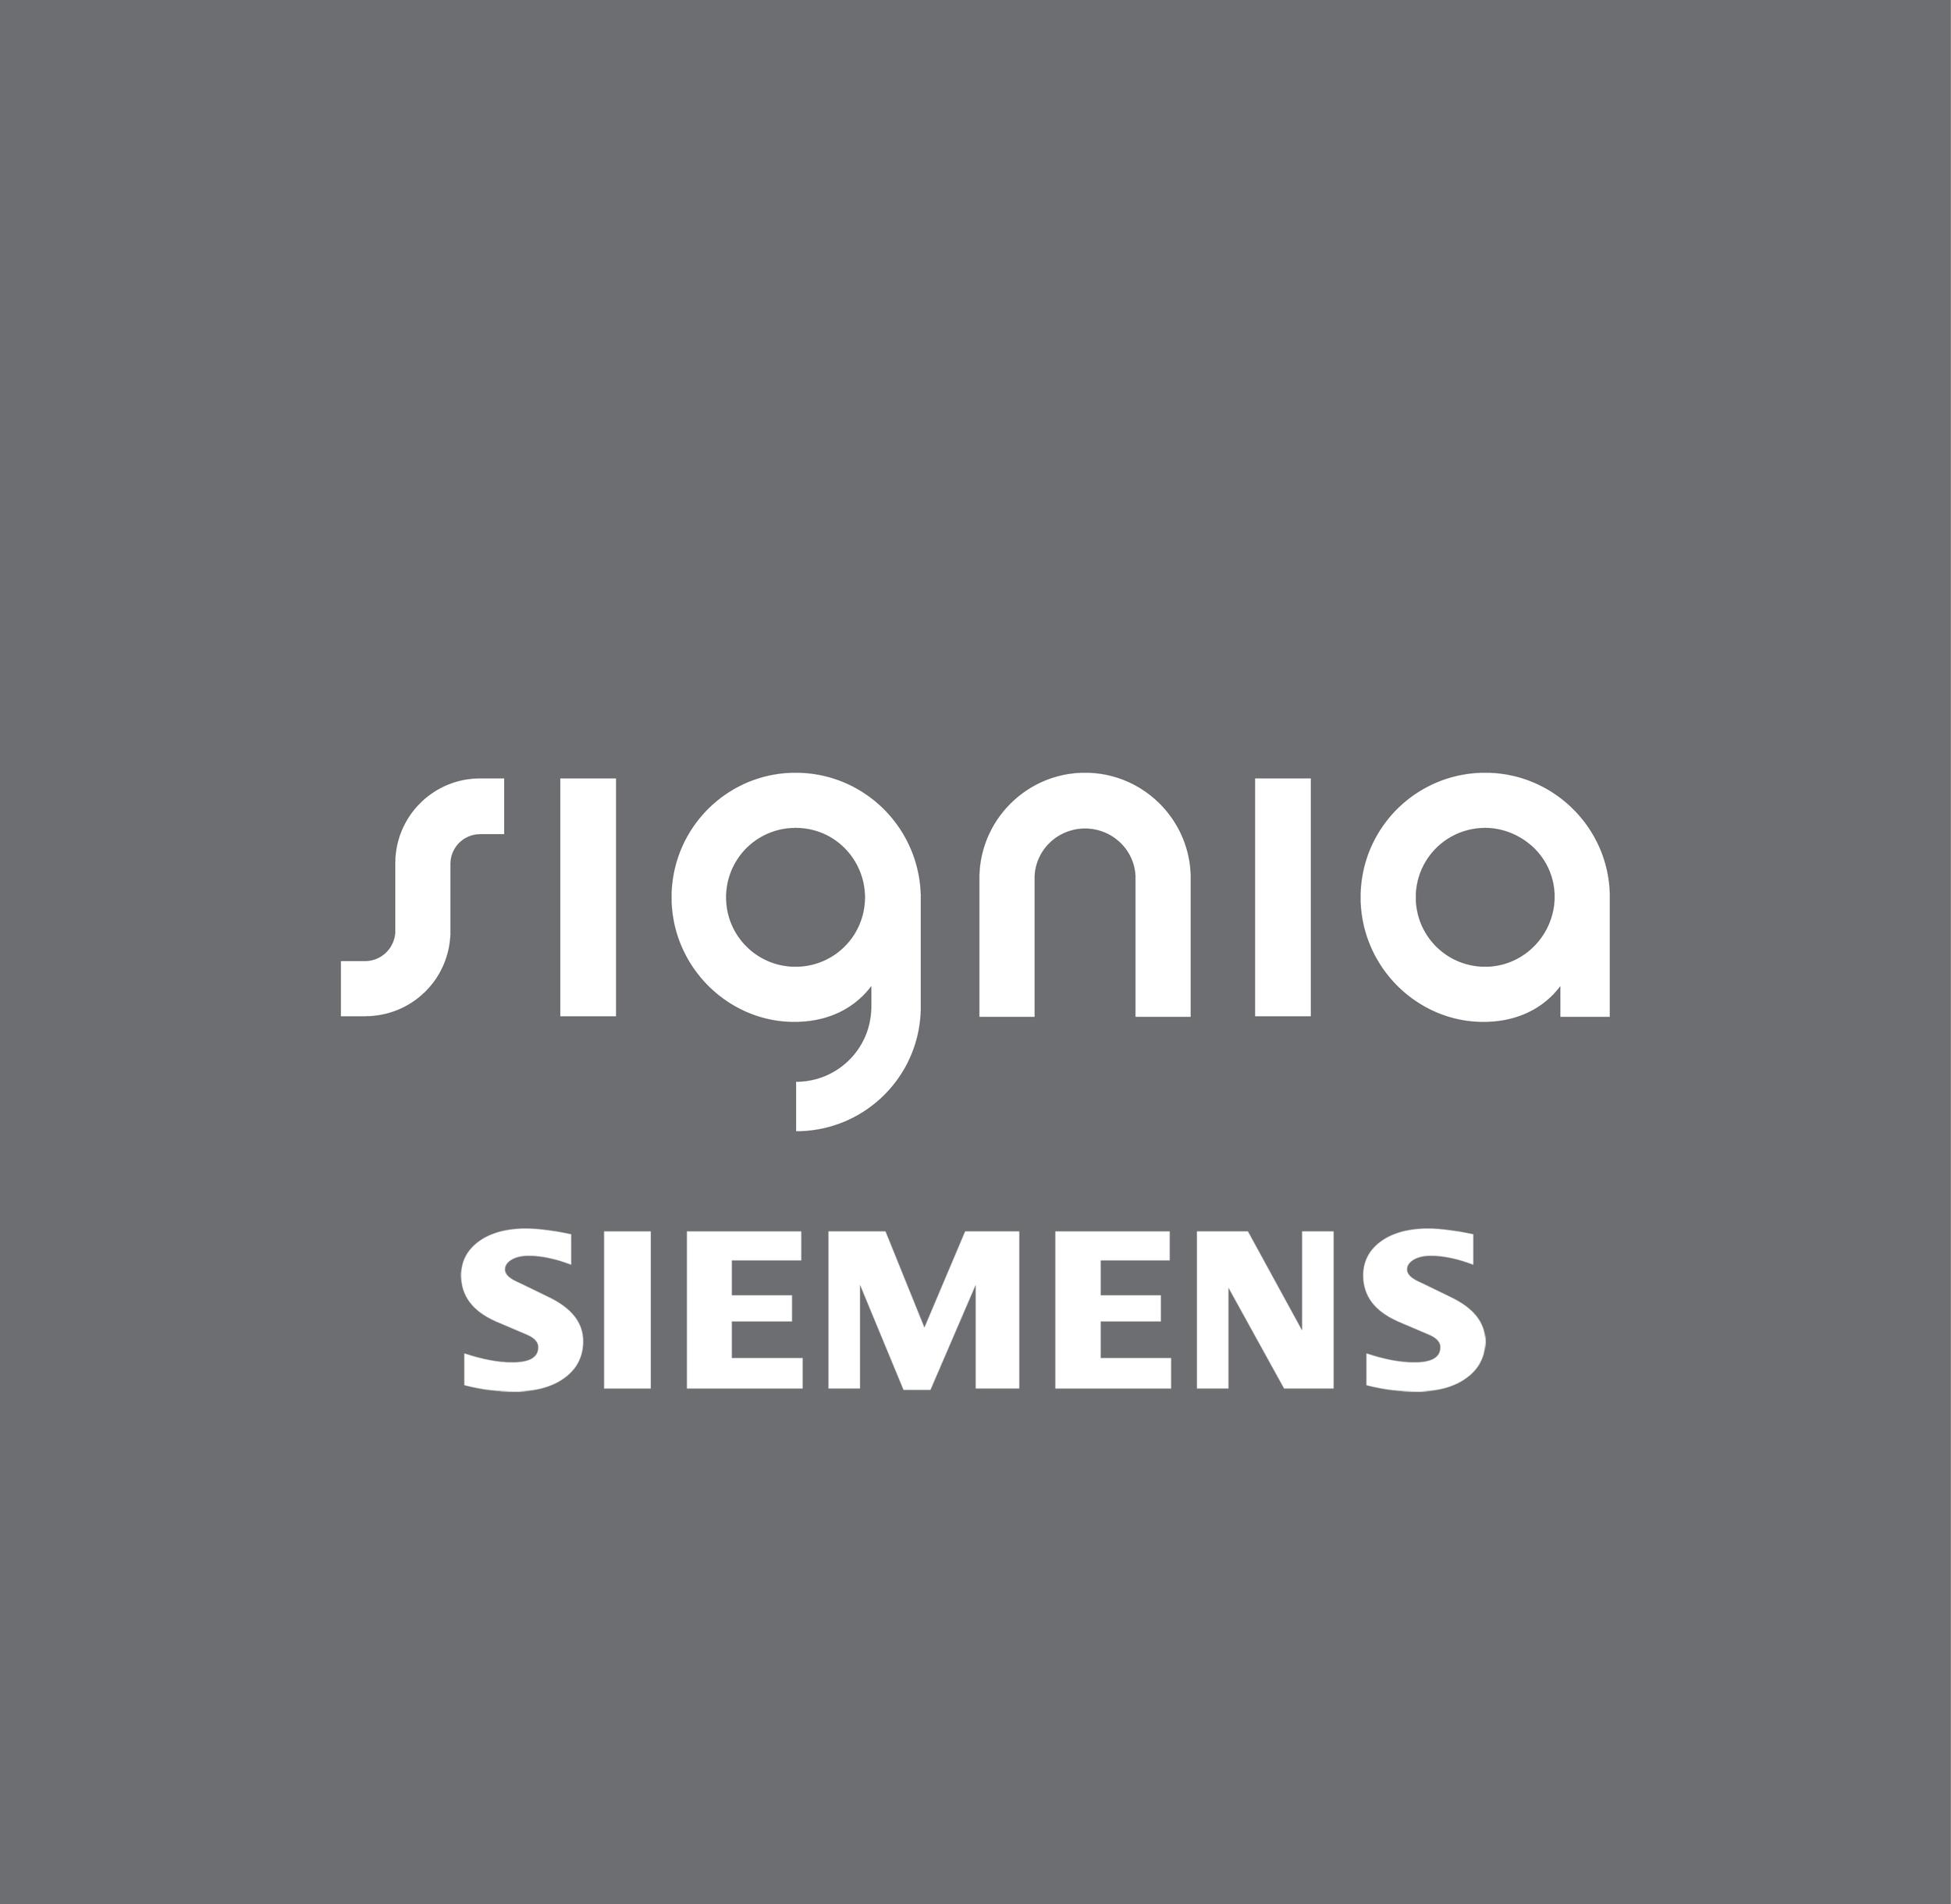 signia_siemens_logo.png